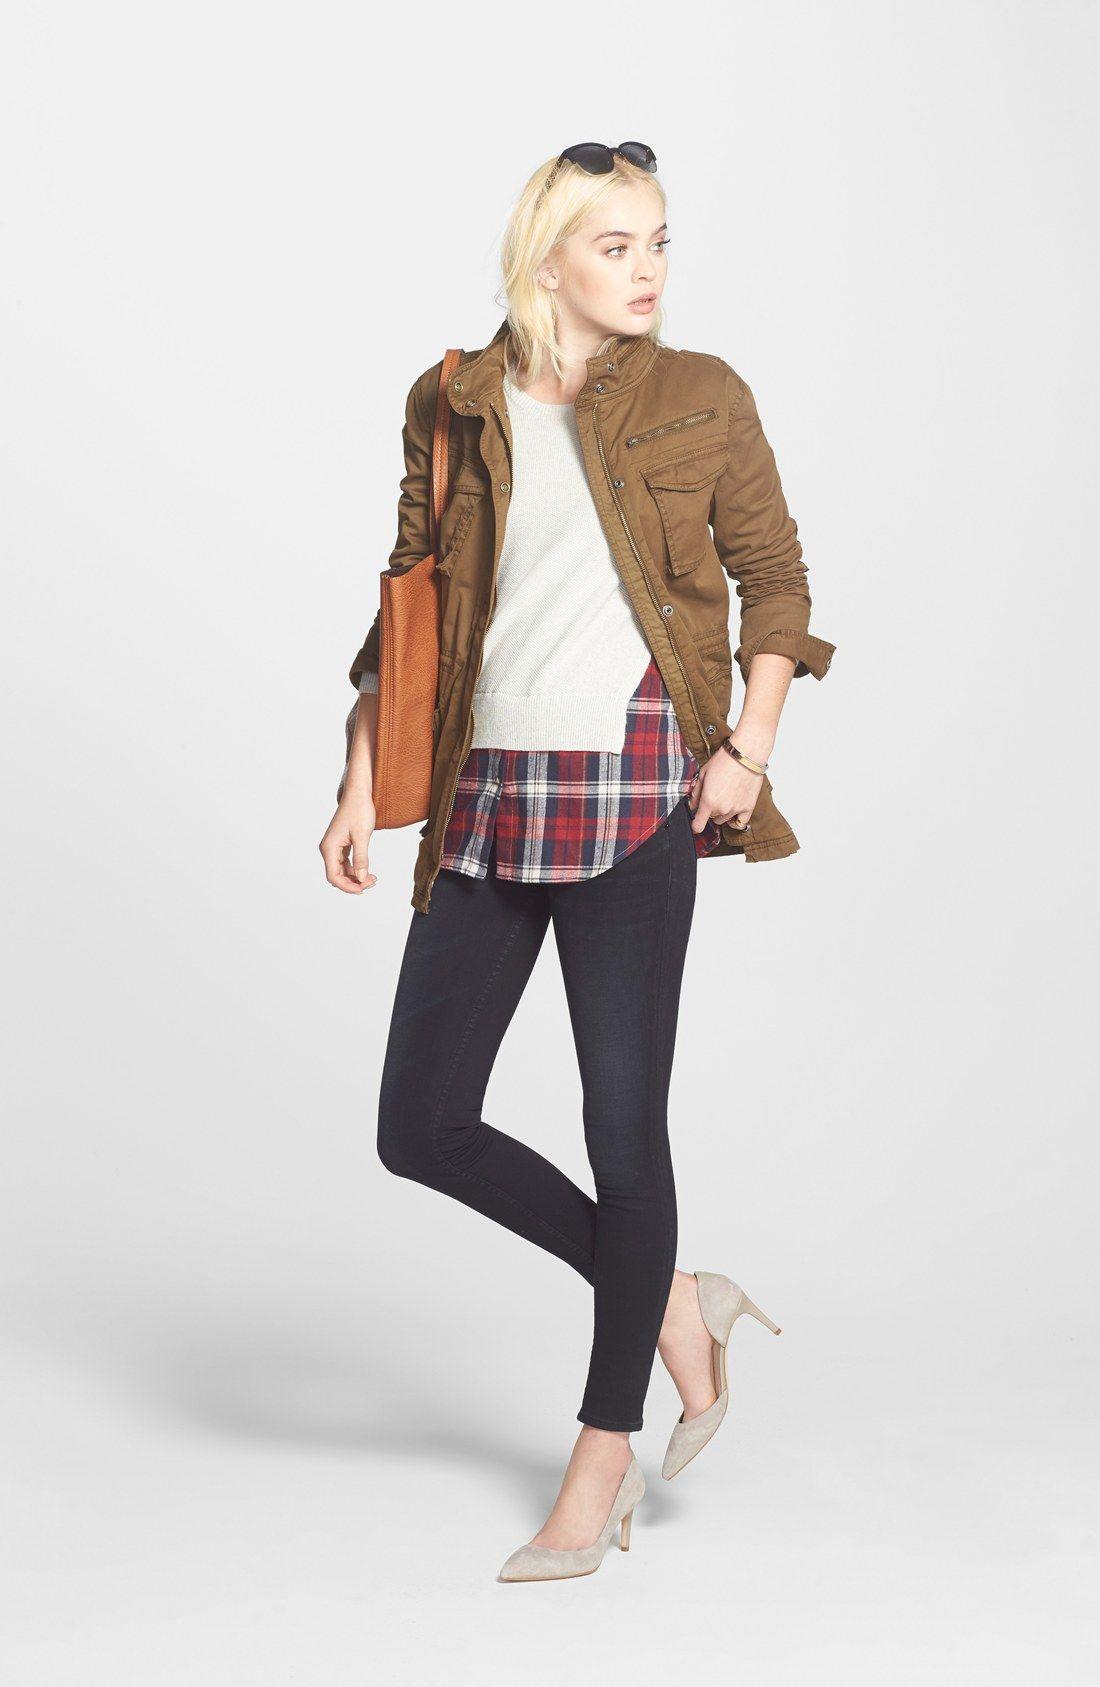 Treasure&Bond Utility Jacket, Layered Sweater & Hudson Jeans Skinny Jeans